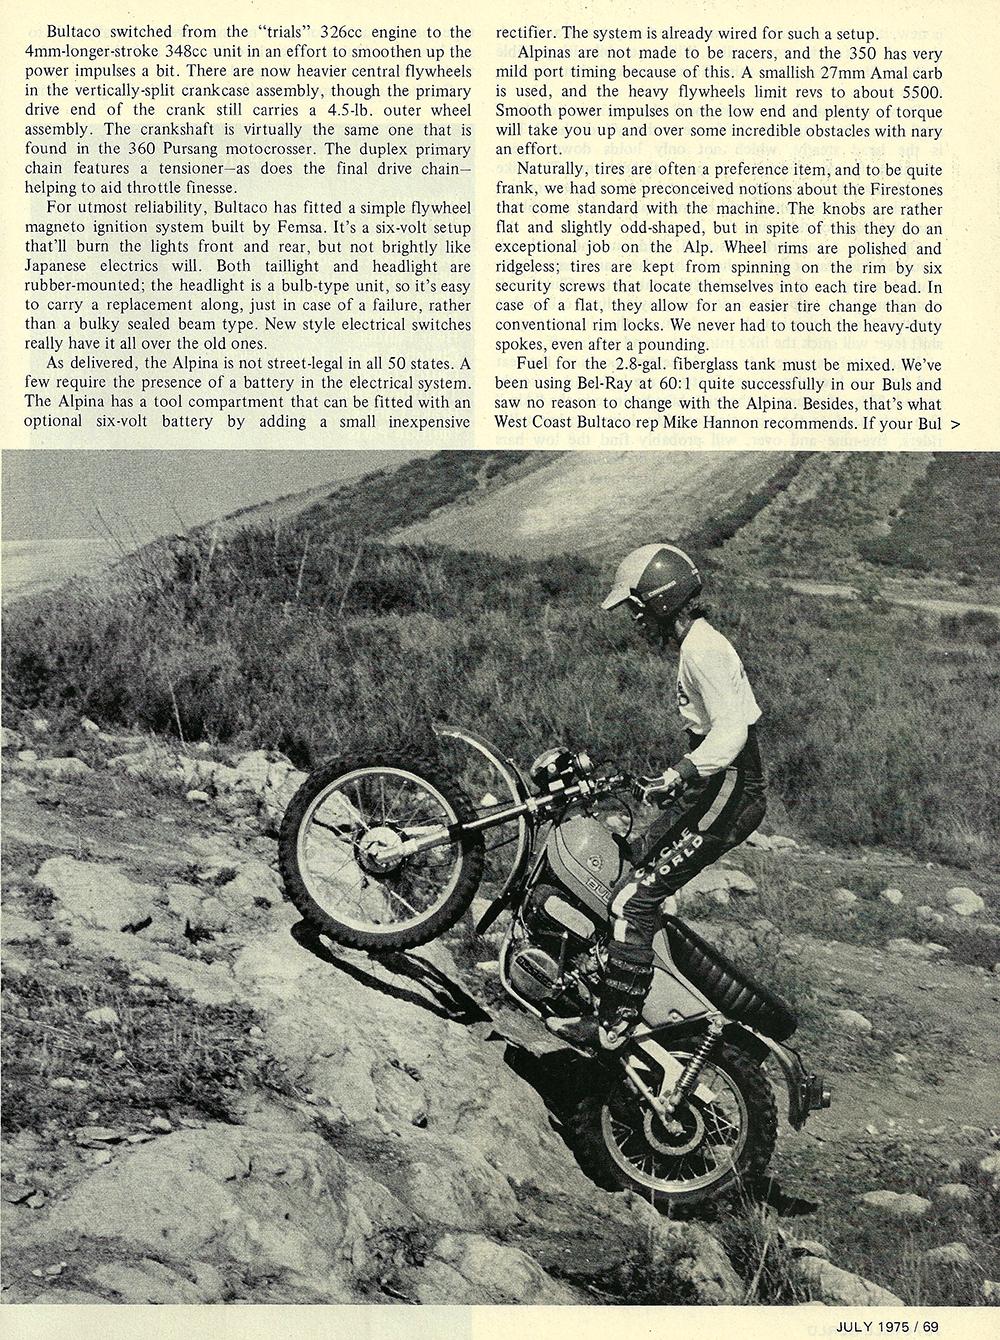 1975 Bultaco Alpina 350 road test 04.jpg